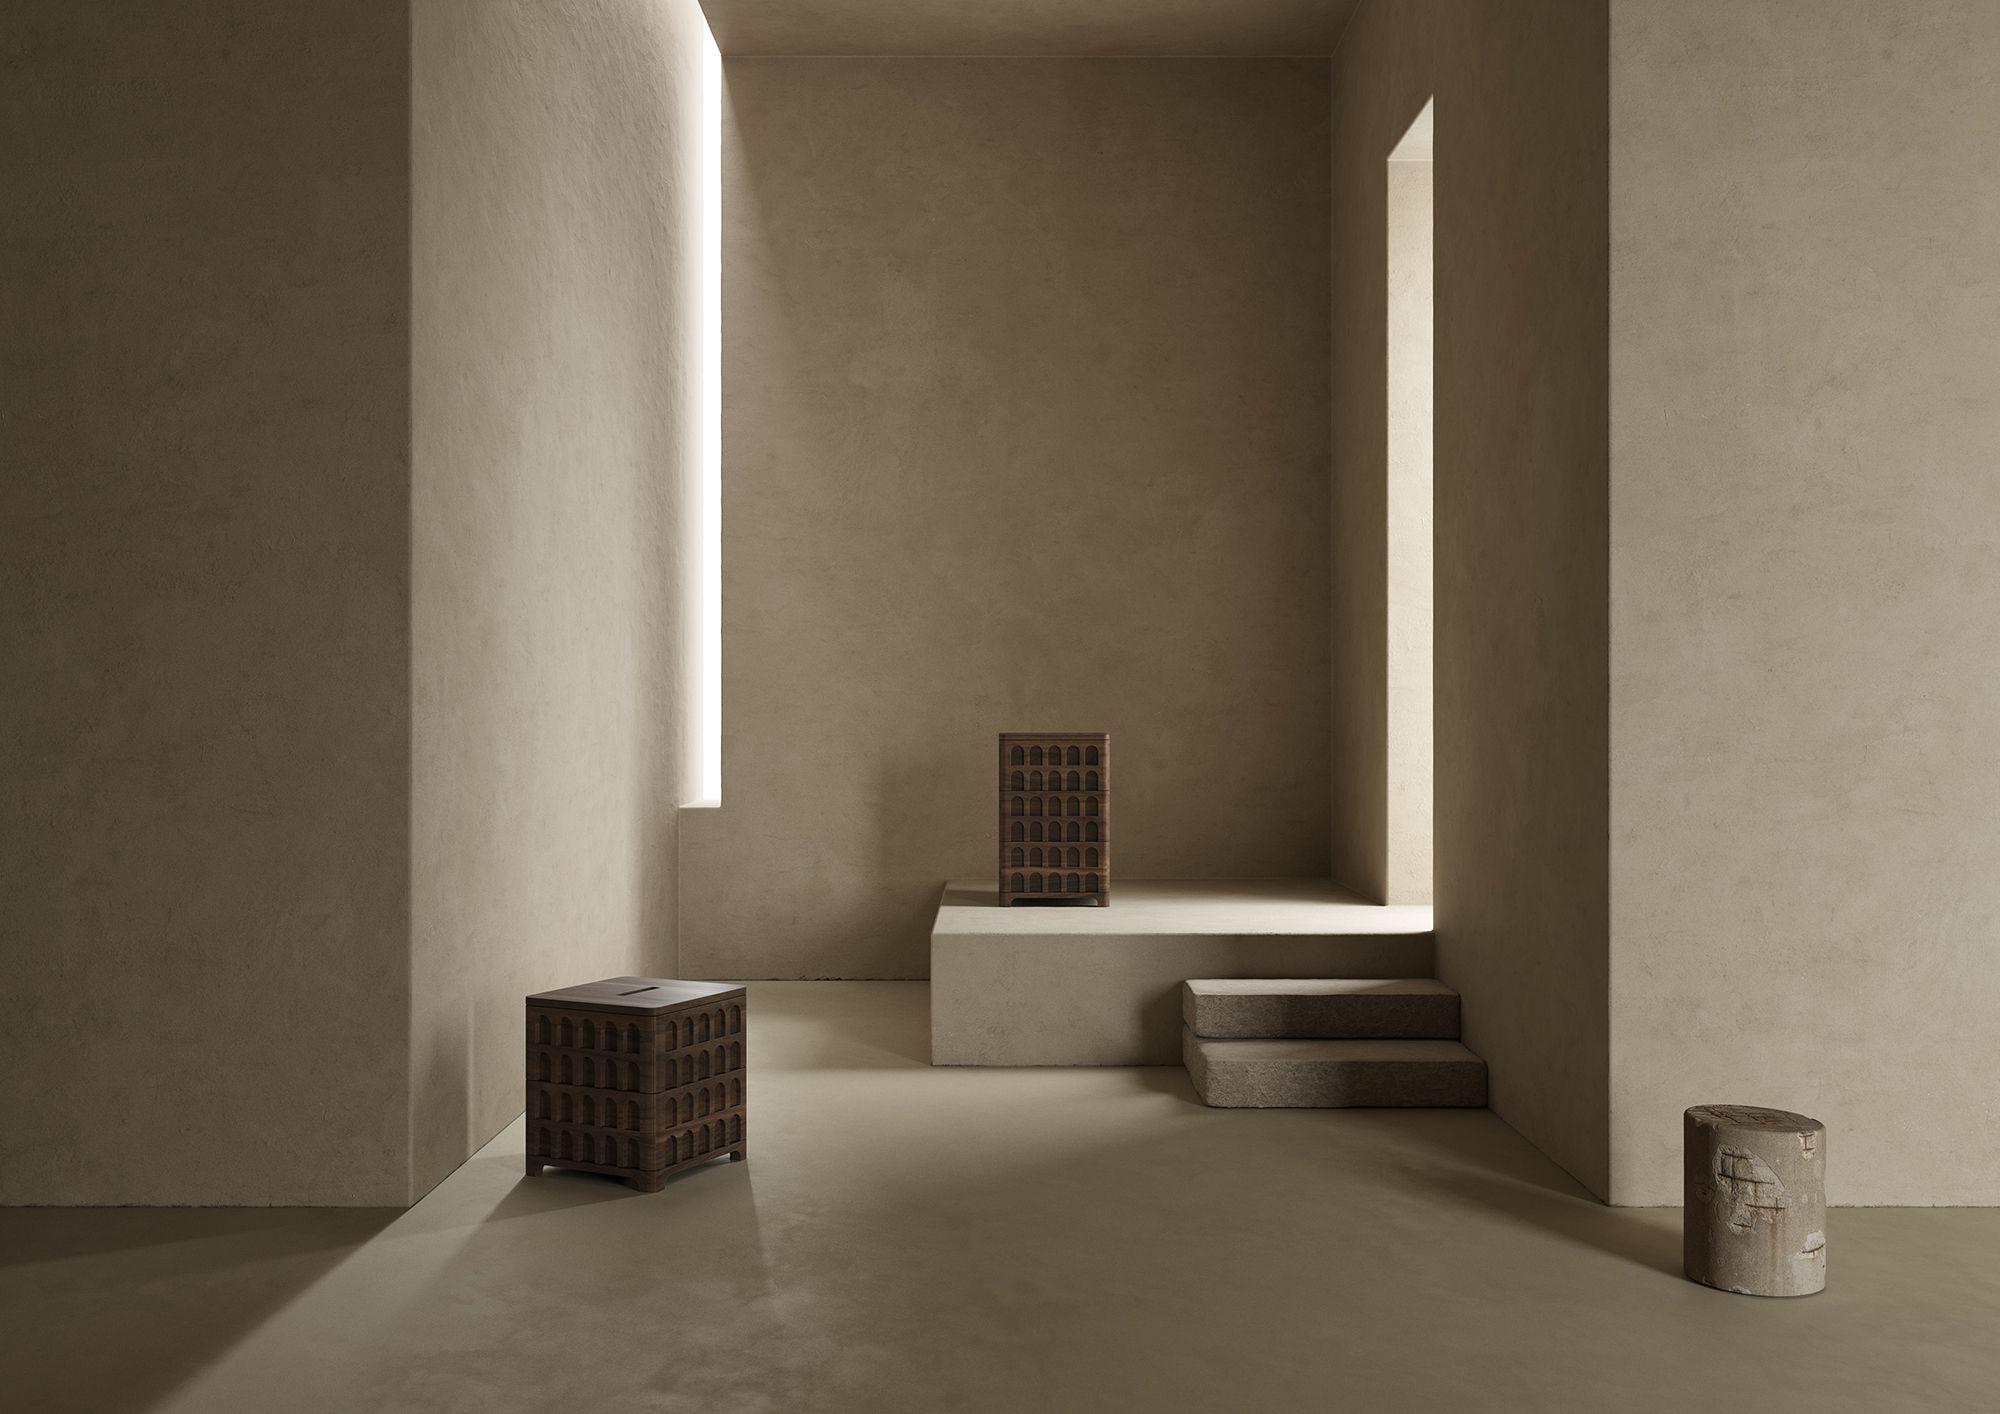 #notooSTUDIO For Nicolò Spinelli • #nottoolate #design #nicolospinelli #architecturallusions • Palassett by @nicolospinelli • #work #light #interiordesign #art #architecture #paciarott #furniture #colors #3d #3drender #coronarender #conceptdesign #styling #setdesign #artdirection #cinema4d #minimalism #materials #shapes #column #sphere #monumental